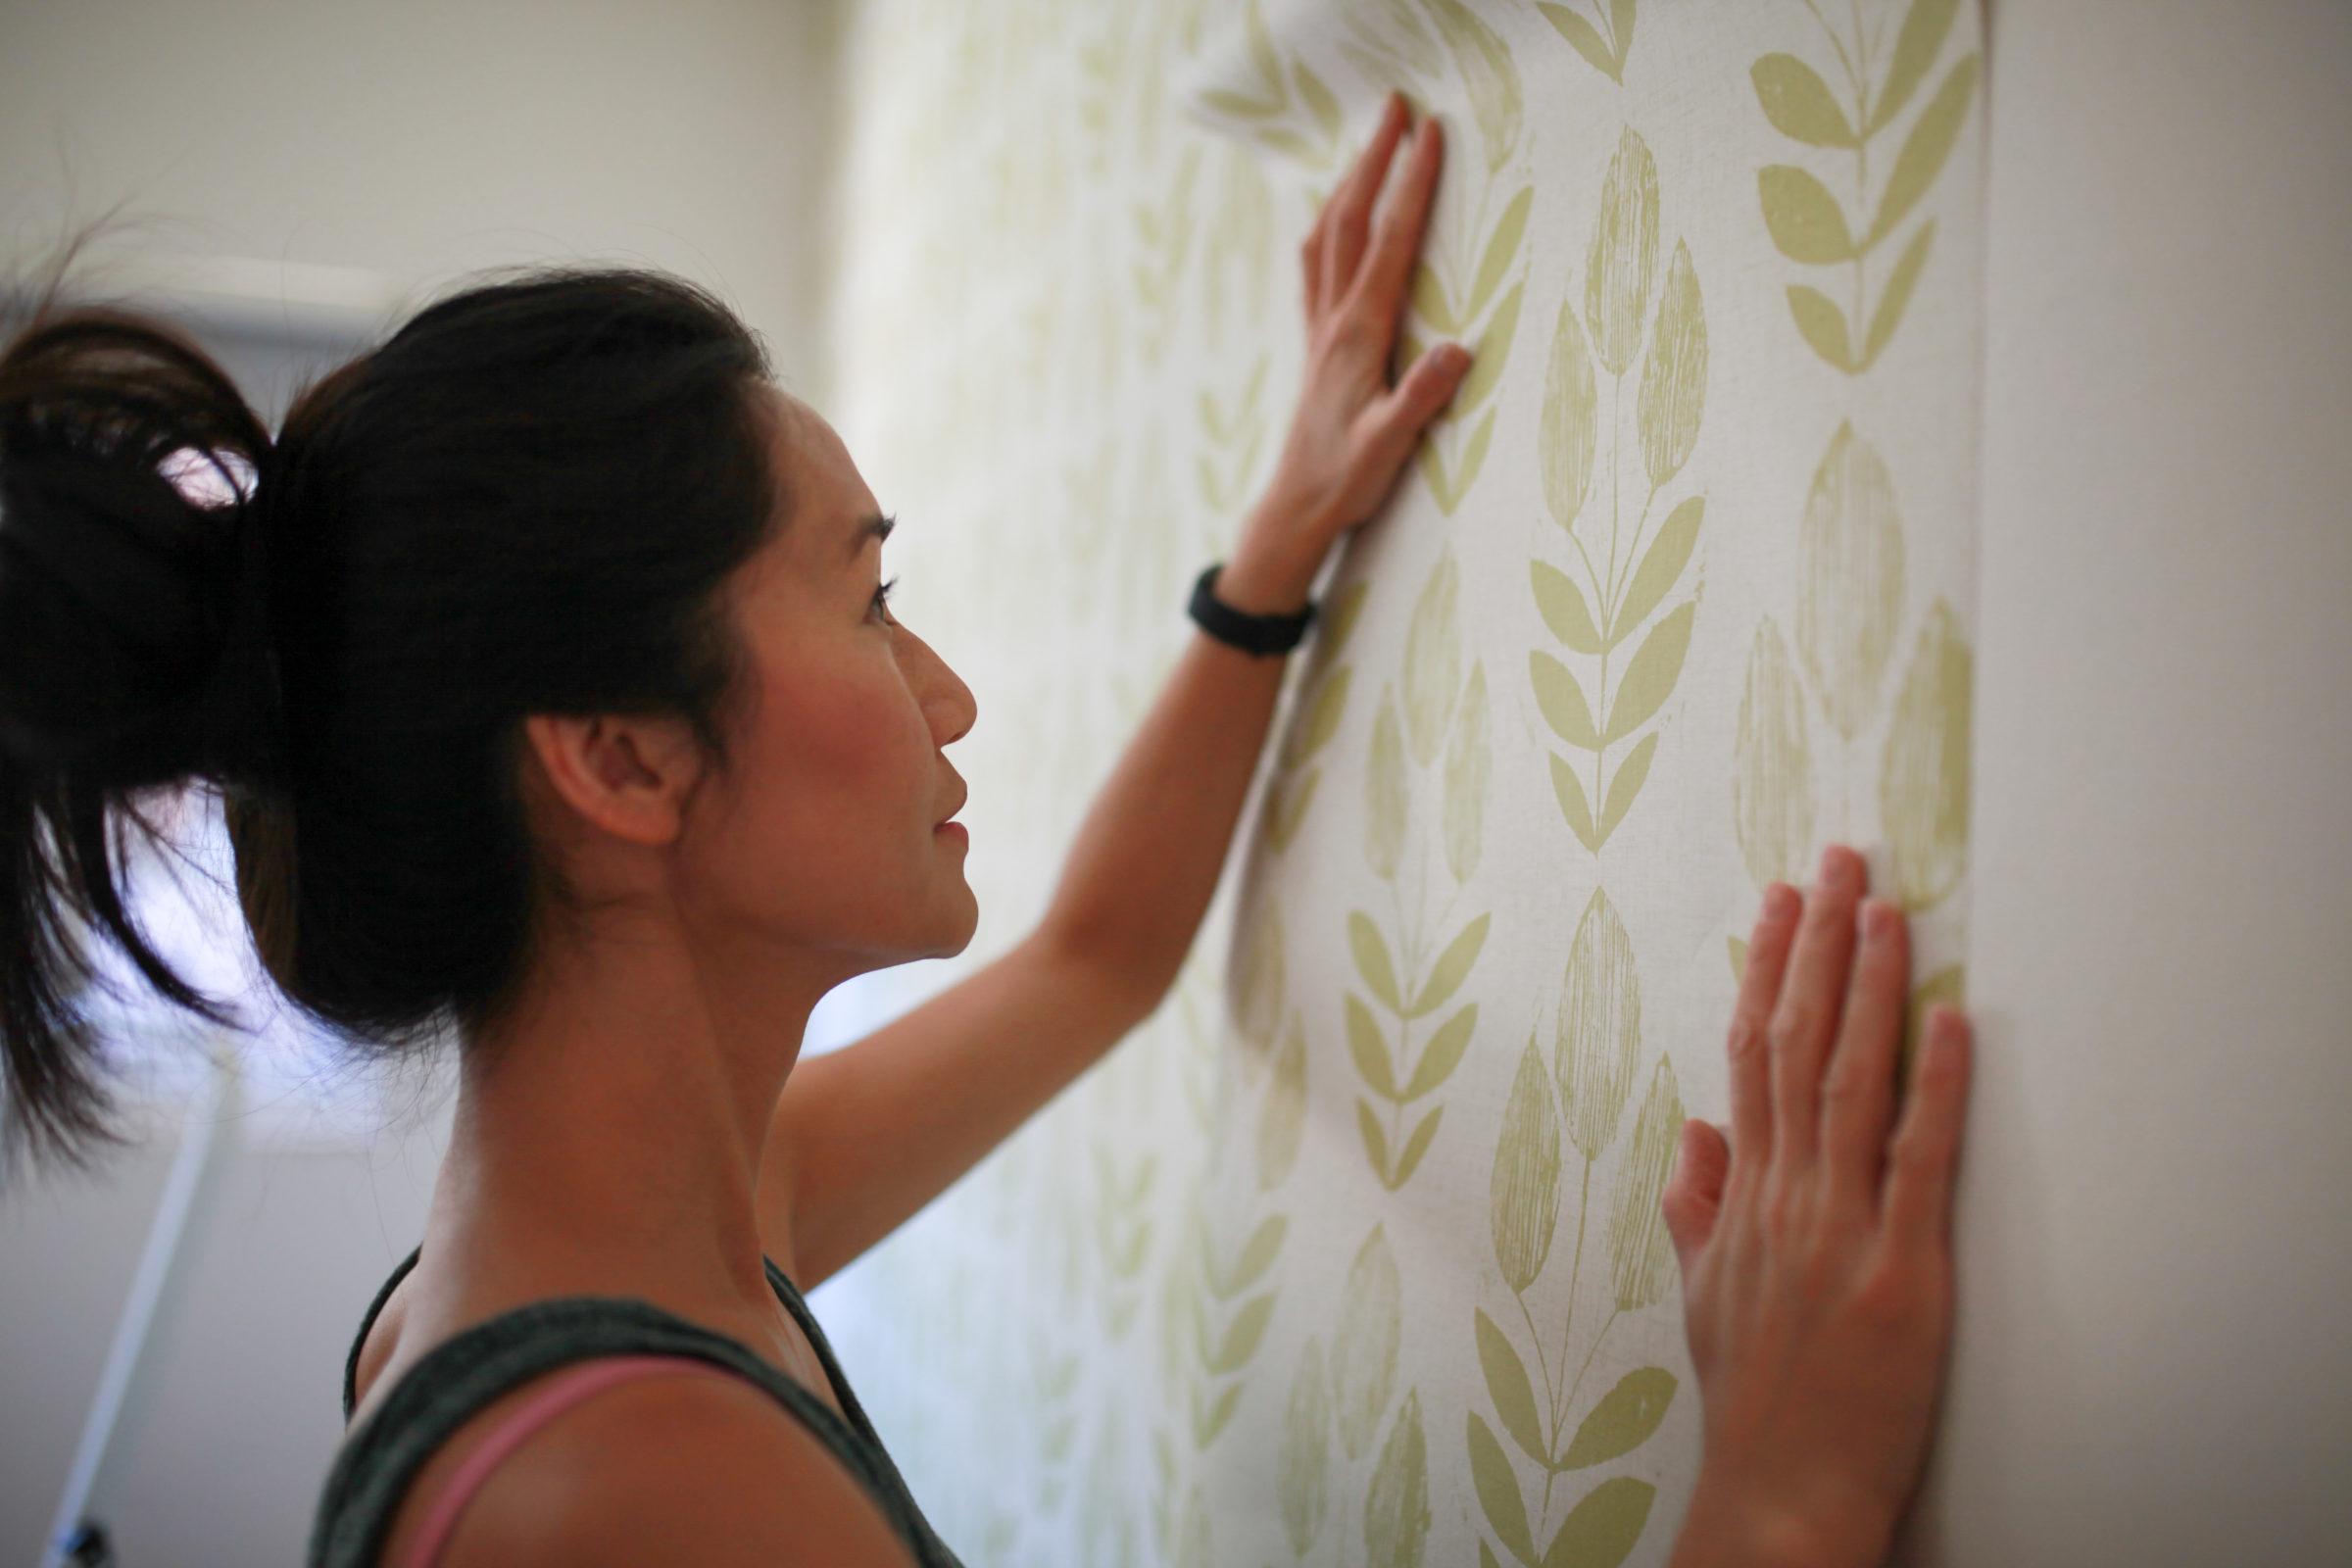 diy project female hanging wallpaper UYMYELA